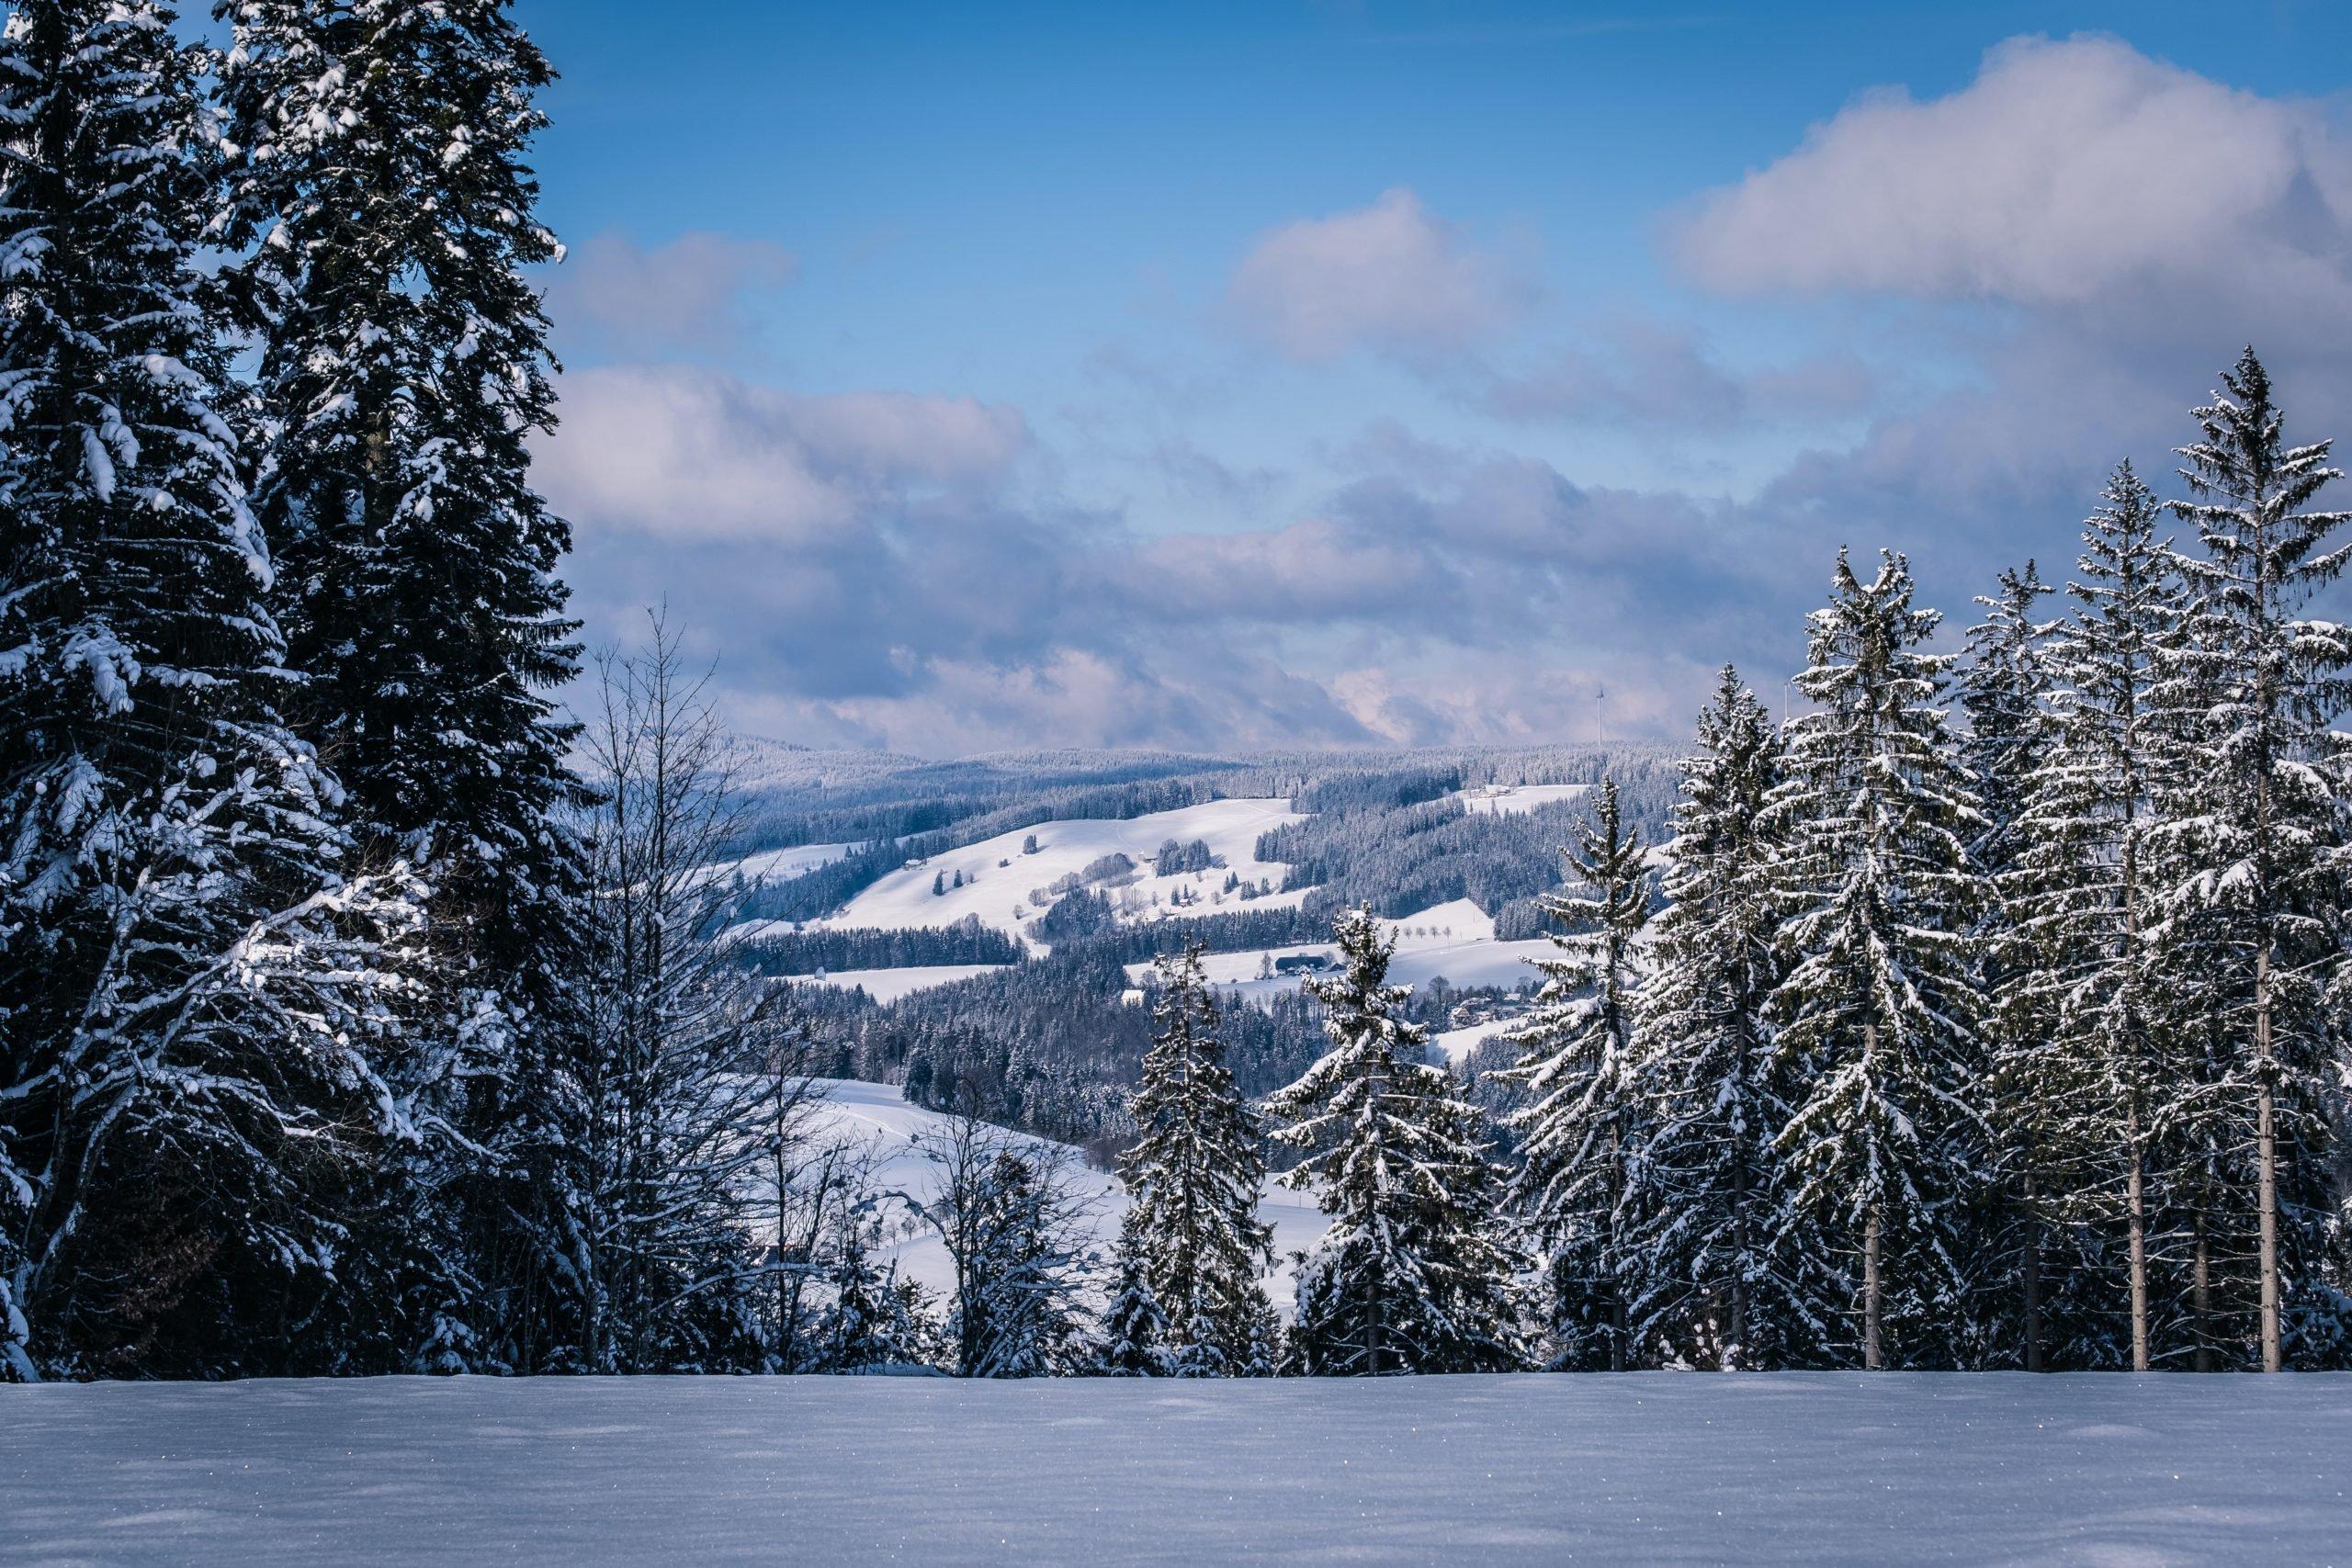 wintercamping_schwarzwald_duitsland